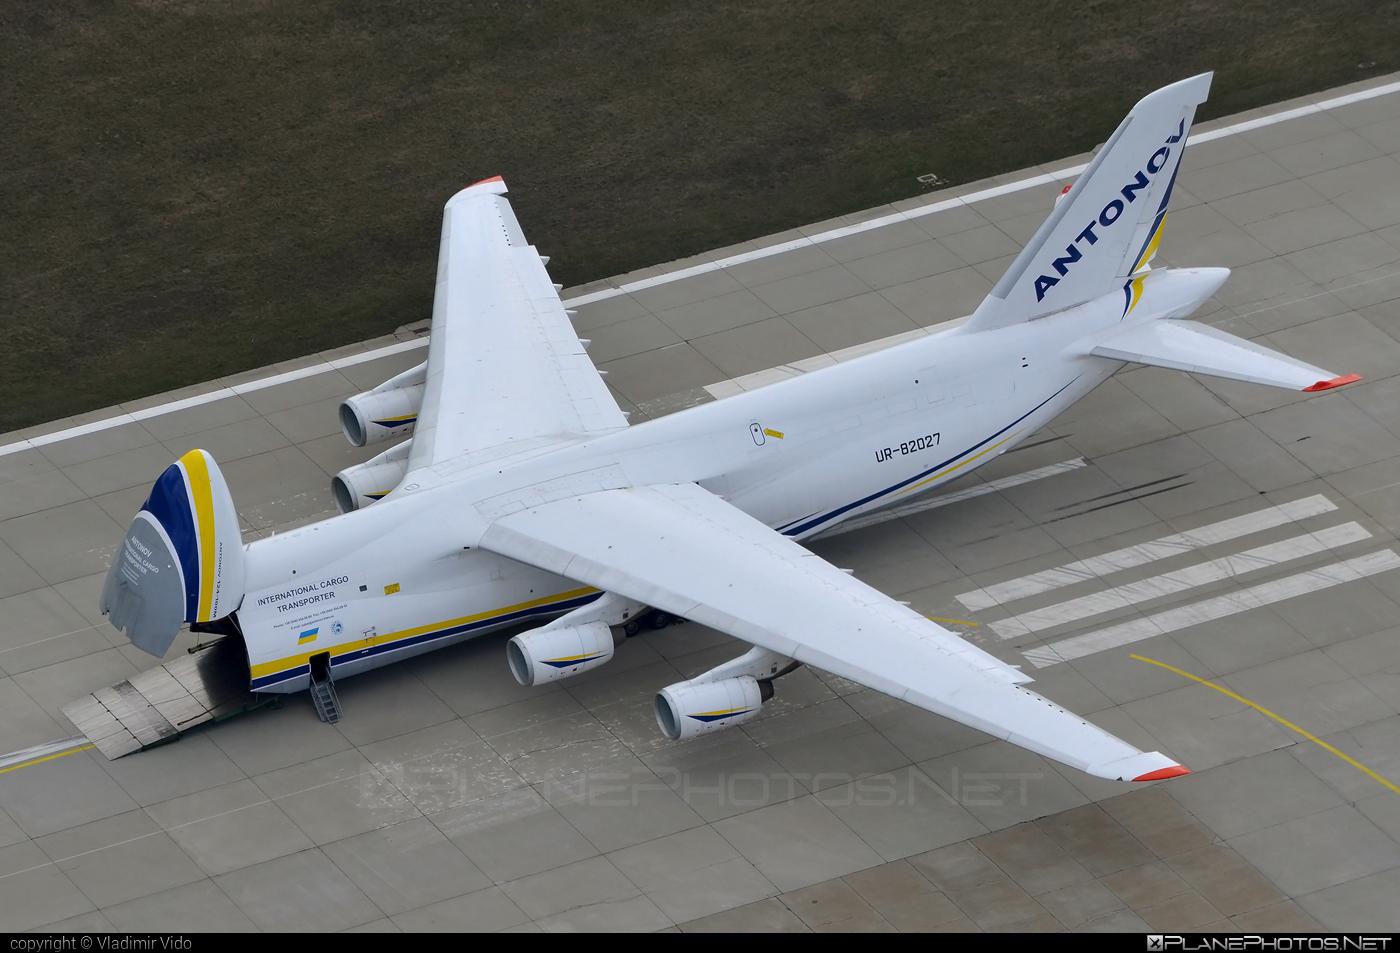 Antonov An-124-100M Ruslan - UR-82027 operated by Antonov Airlines #AntonovAirlines #an124 #an124100m #an124100mruslan #an124ruslan #antonov #antonov124 #antonovan124